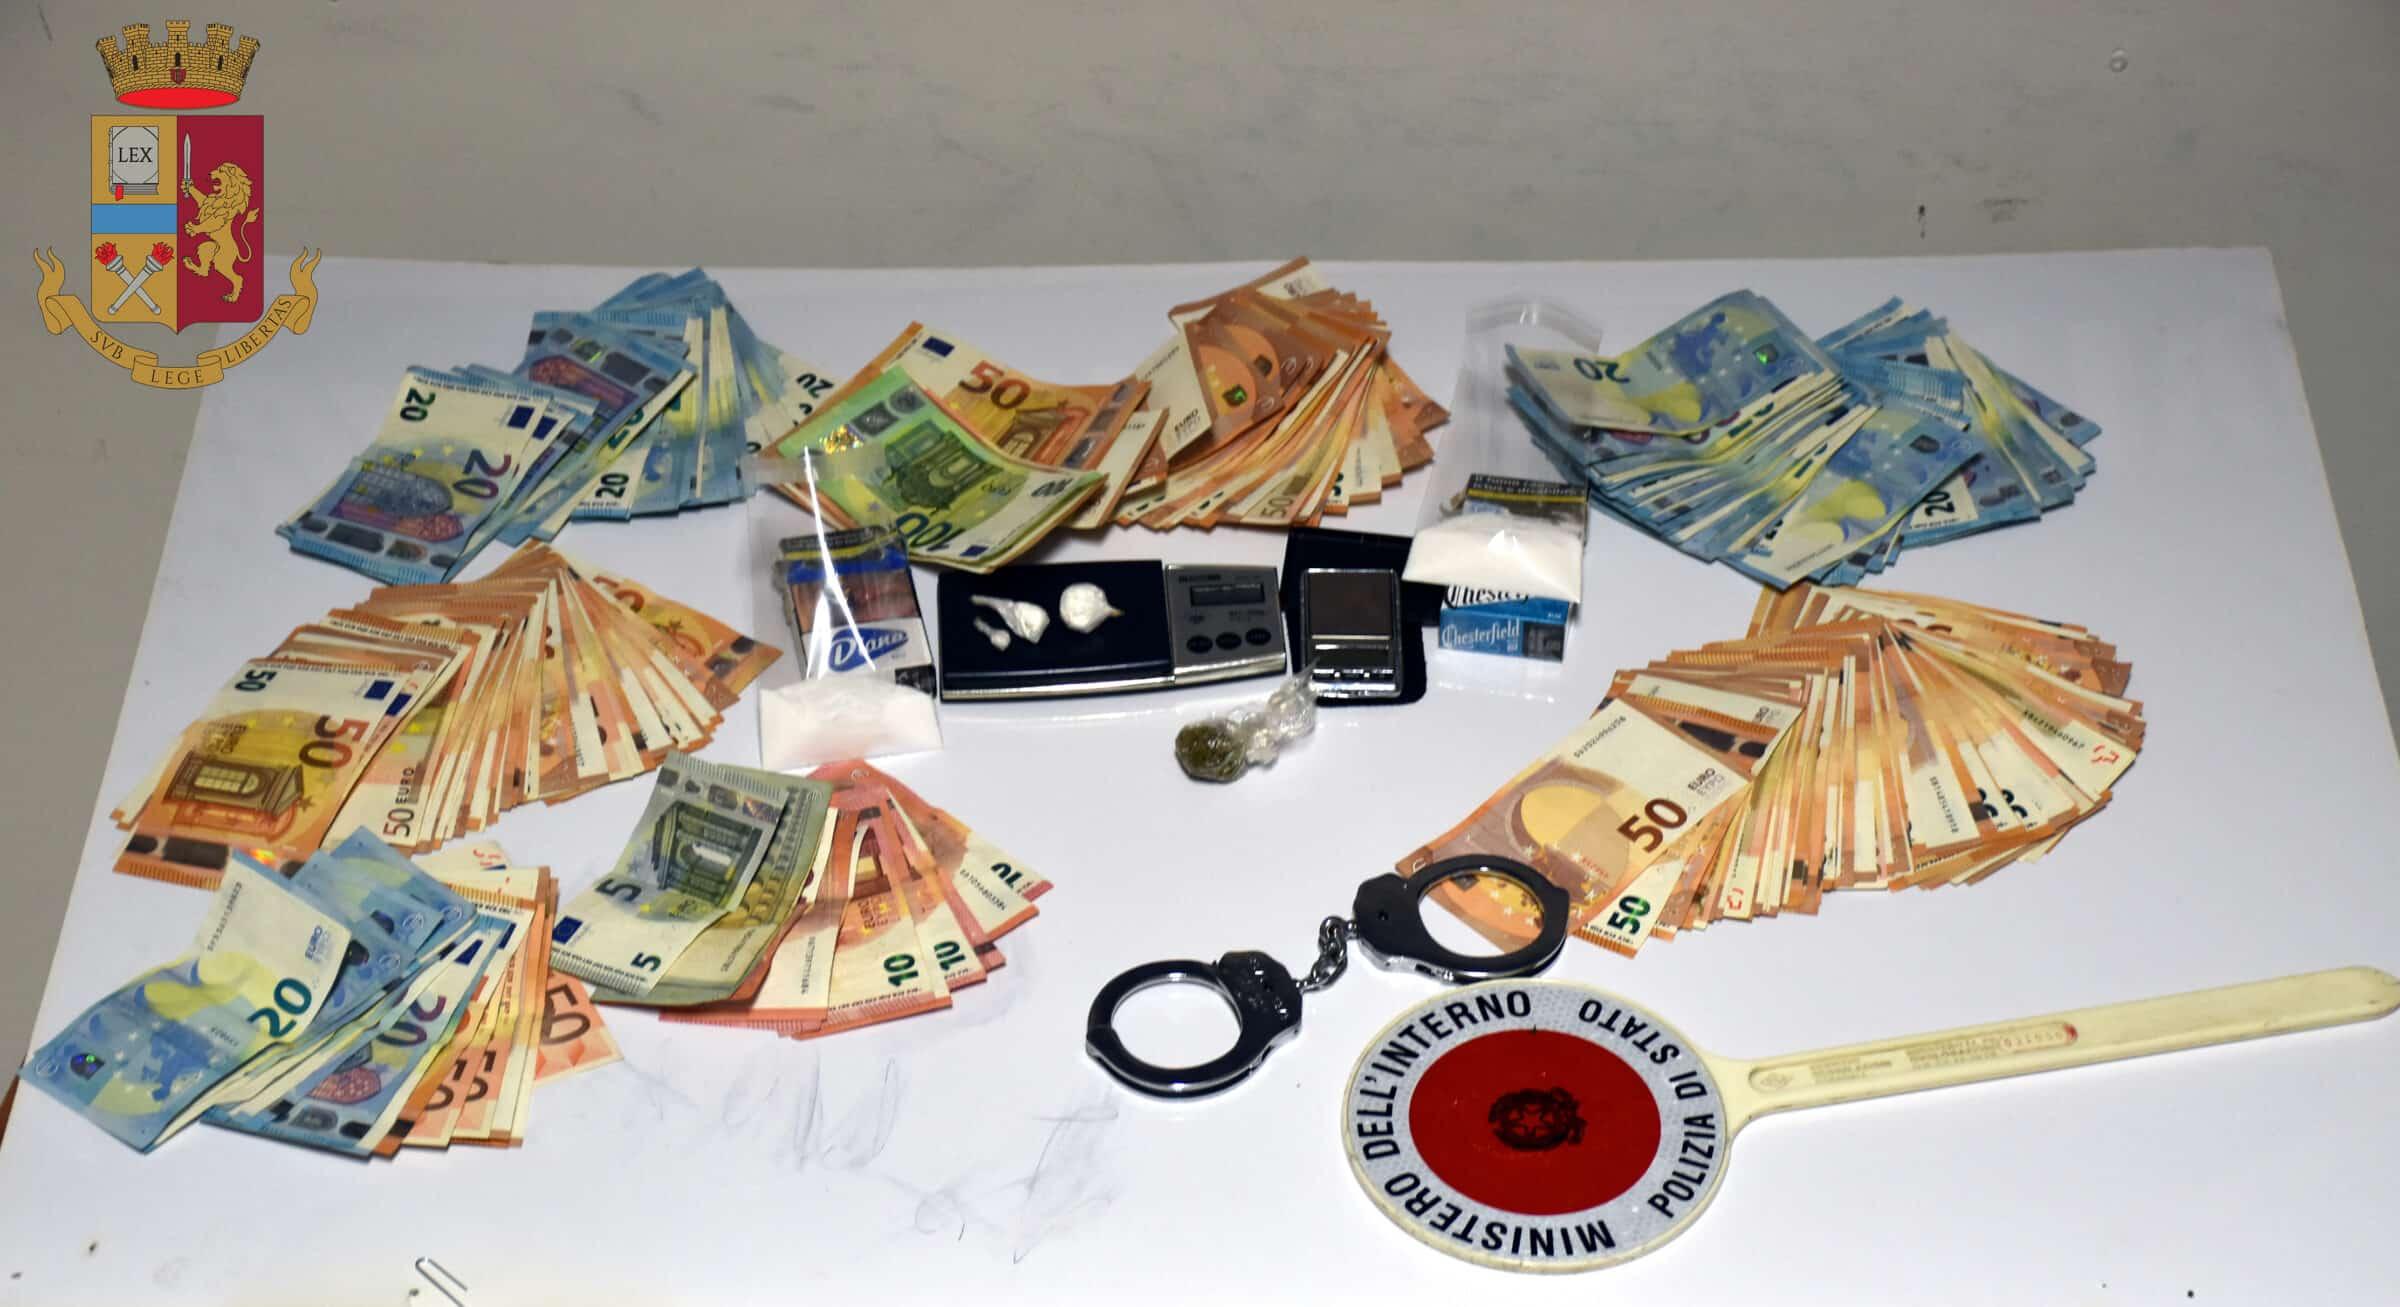 Spacciava cocaina e marijuana in periferia, 35enne finisce agli arresti domiciliari